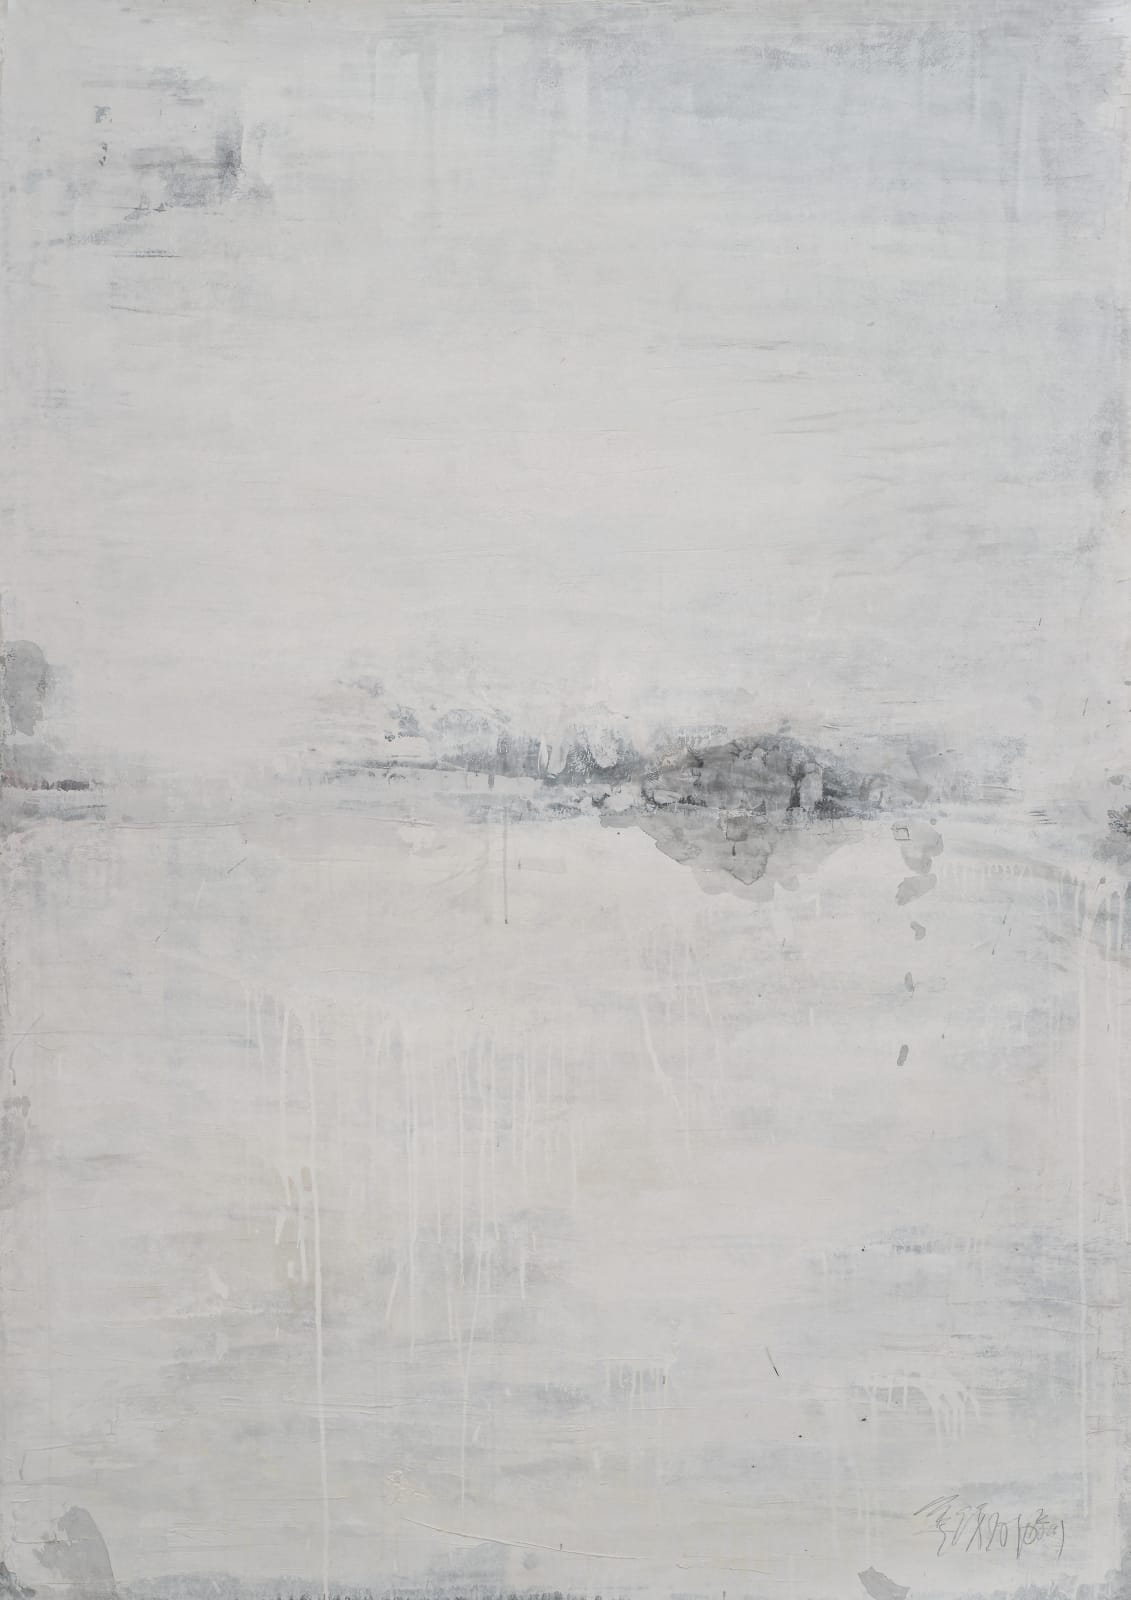 Yan Shanchun 嚴善錞, Ruangongdun No. 16 阮公墩之十六, 2008